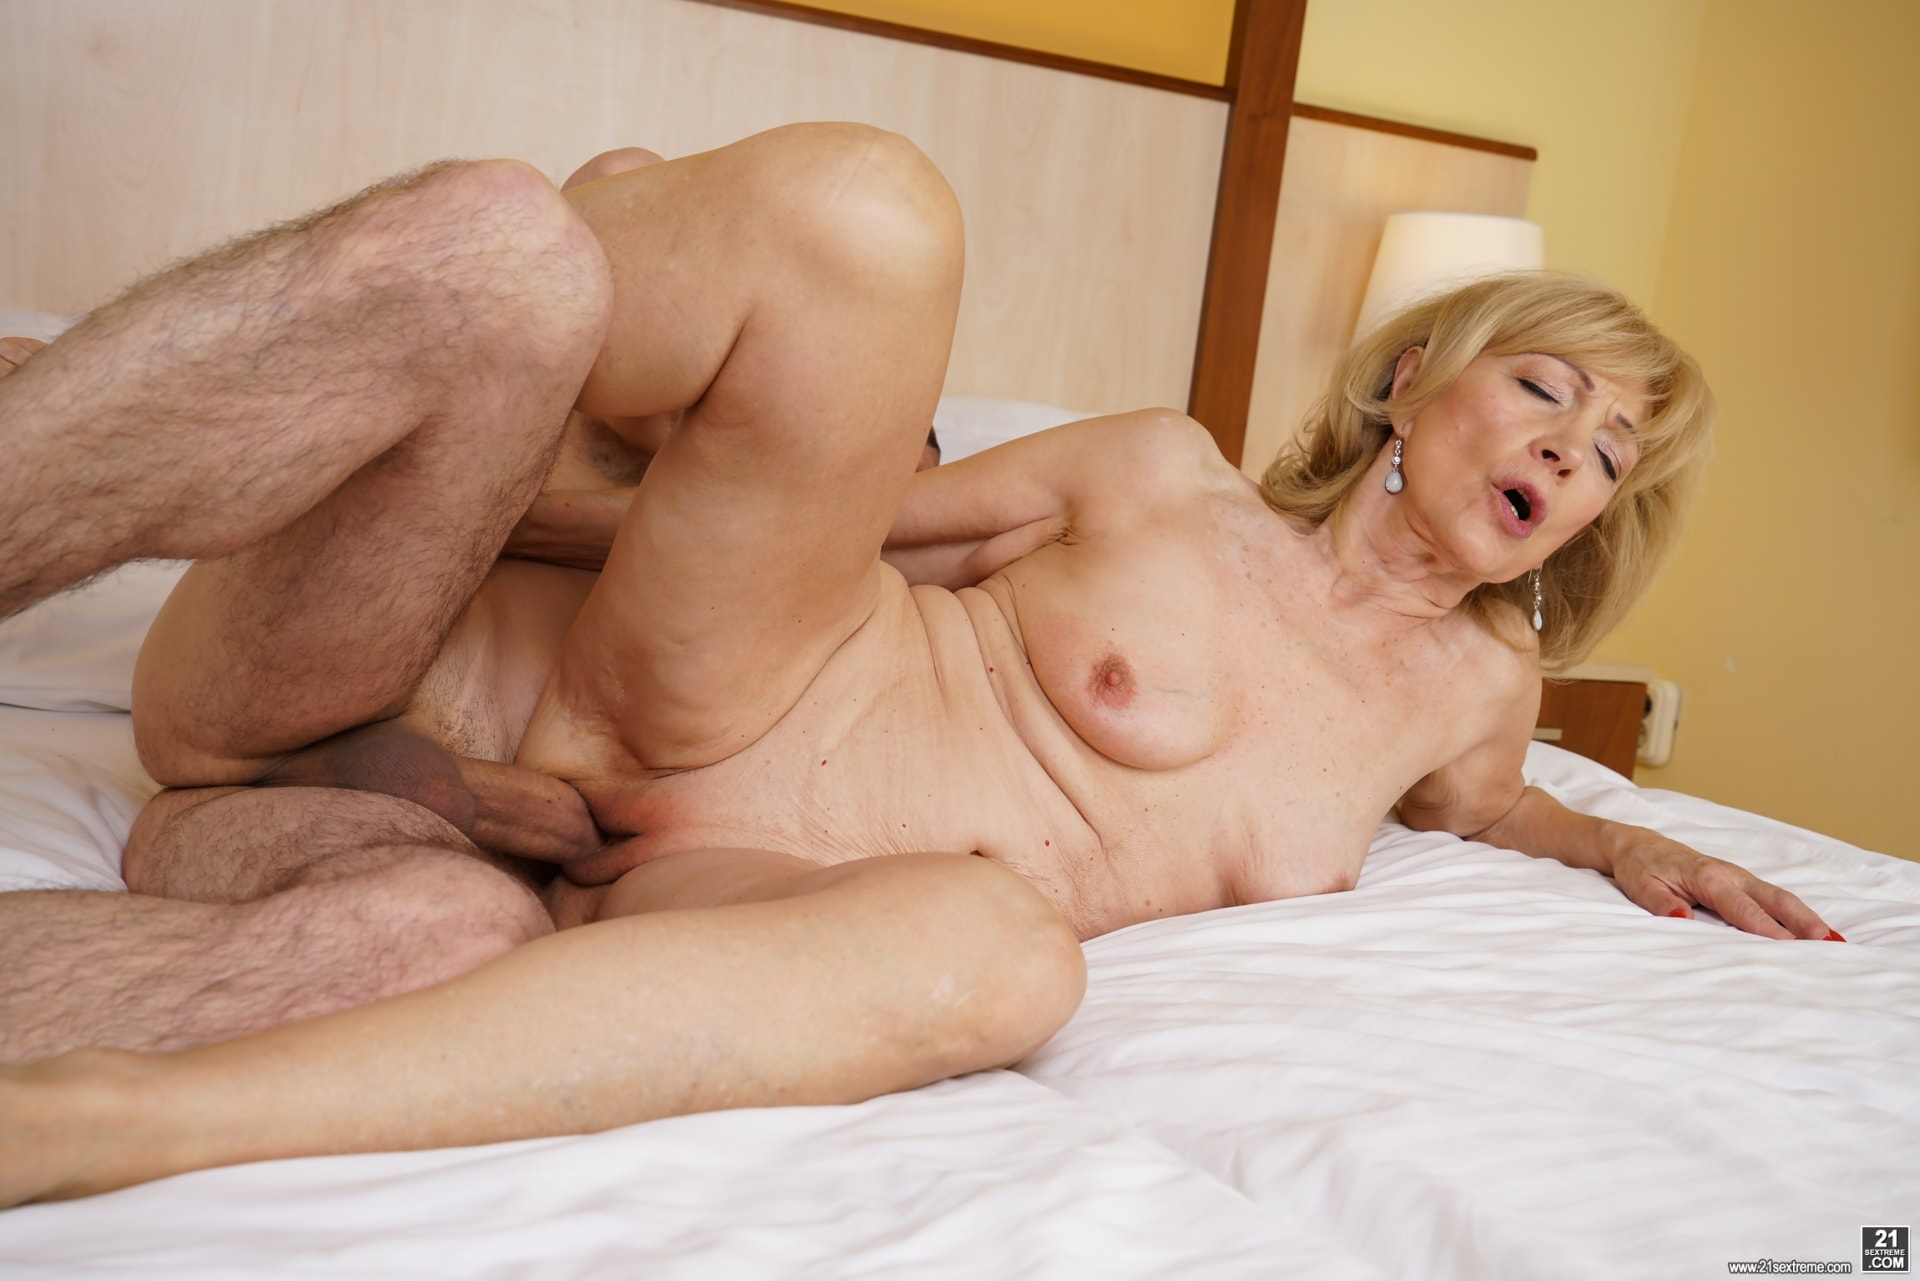 21Sextury 'Lusty Szuzanne's Naughty Fun' starring Szuzanne (Photo 132)